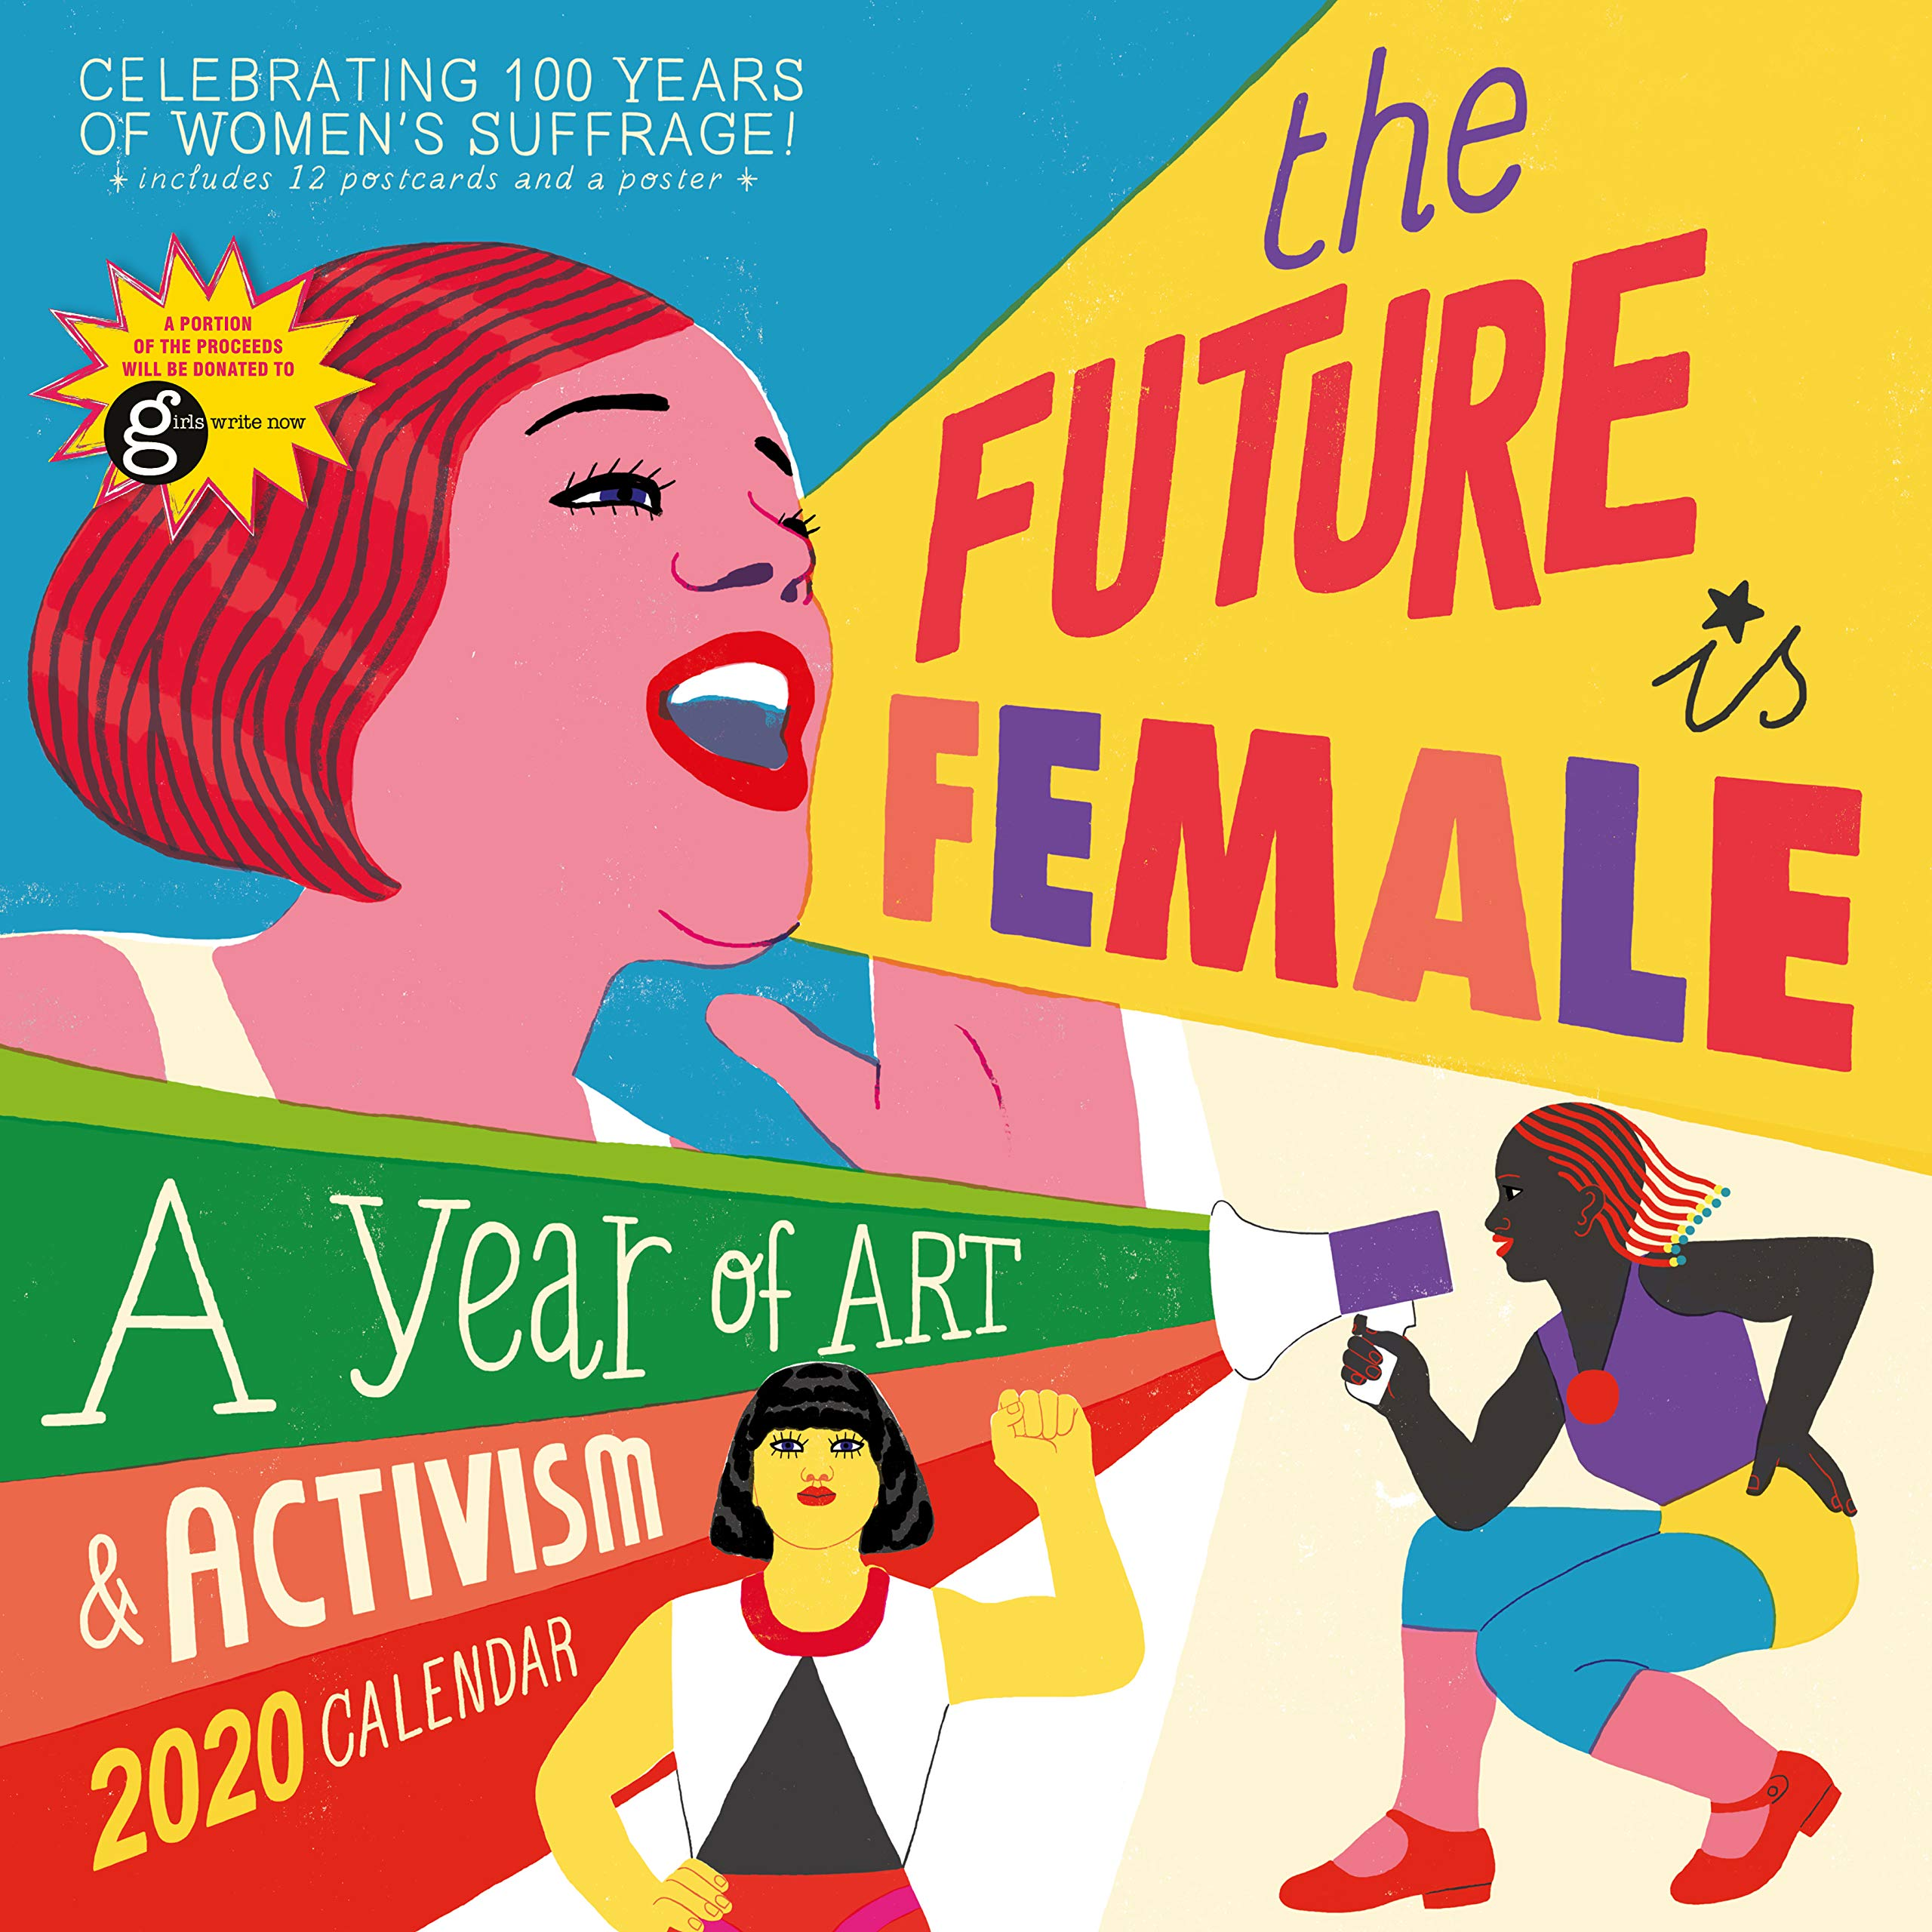 Celebration Calendar 2020 The Future Is Female Wall Calendar 2020: Workman Publishing